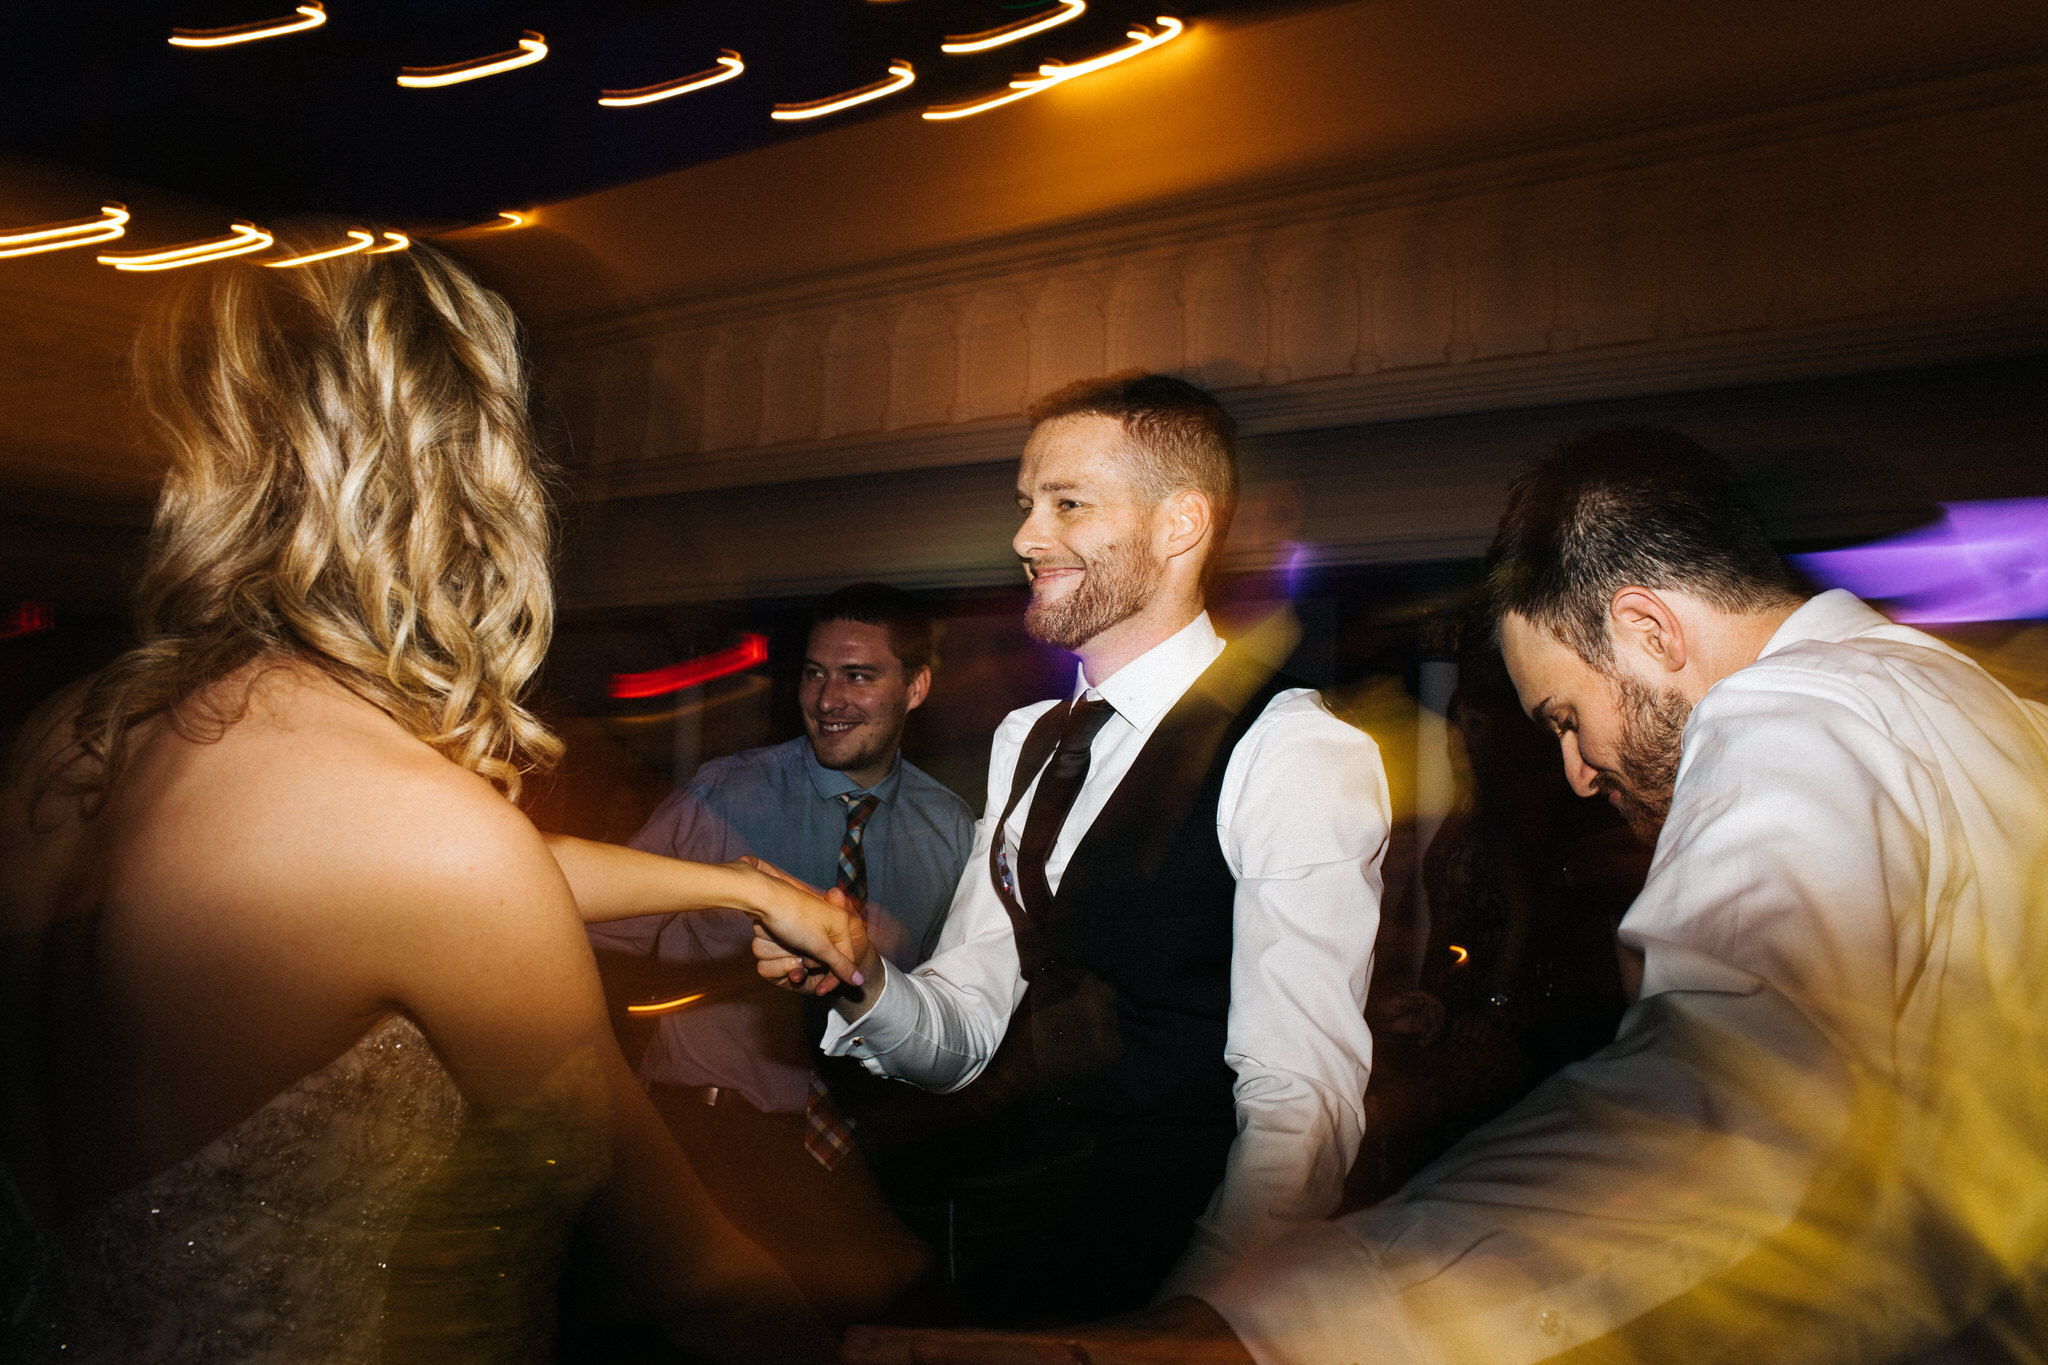 party photos, guest photos, berkeley church wedding, bridal portraits, toronto wedding photographer, berkeley field house, dinner berkeley church